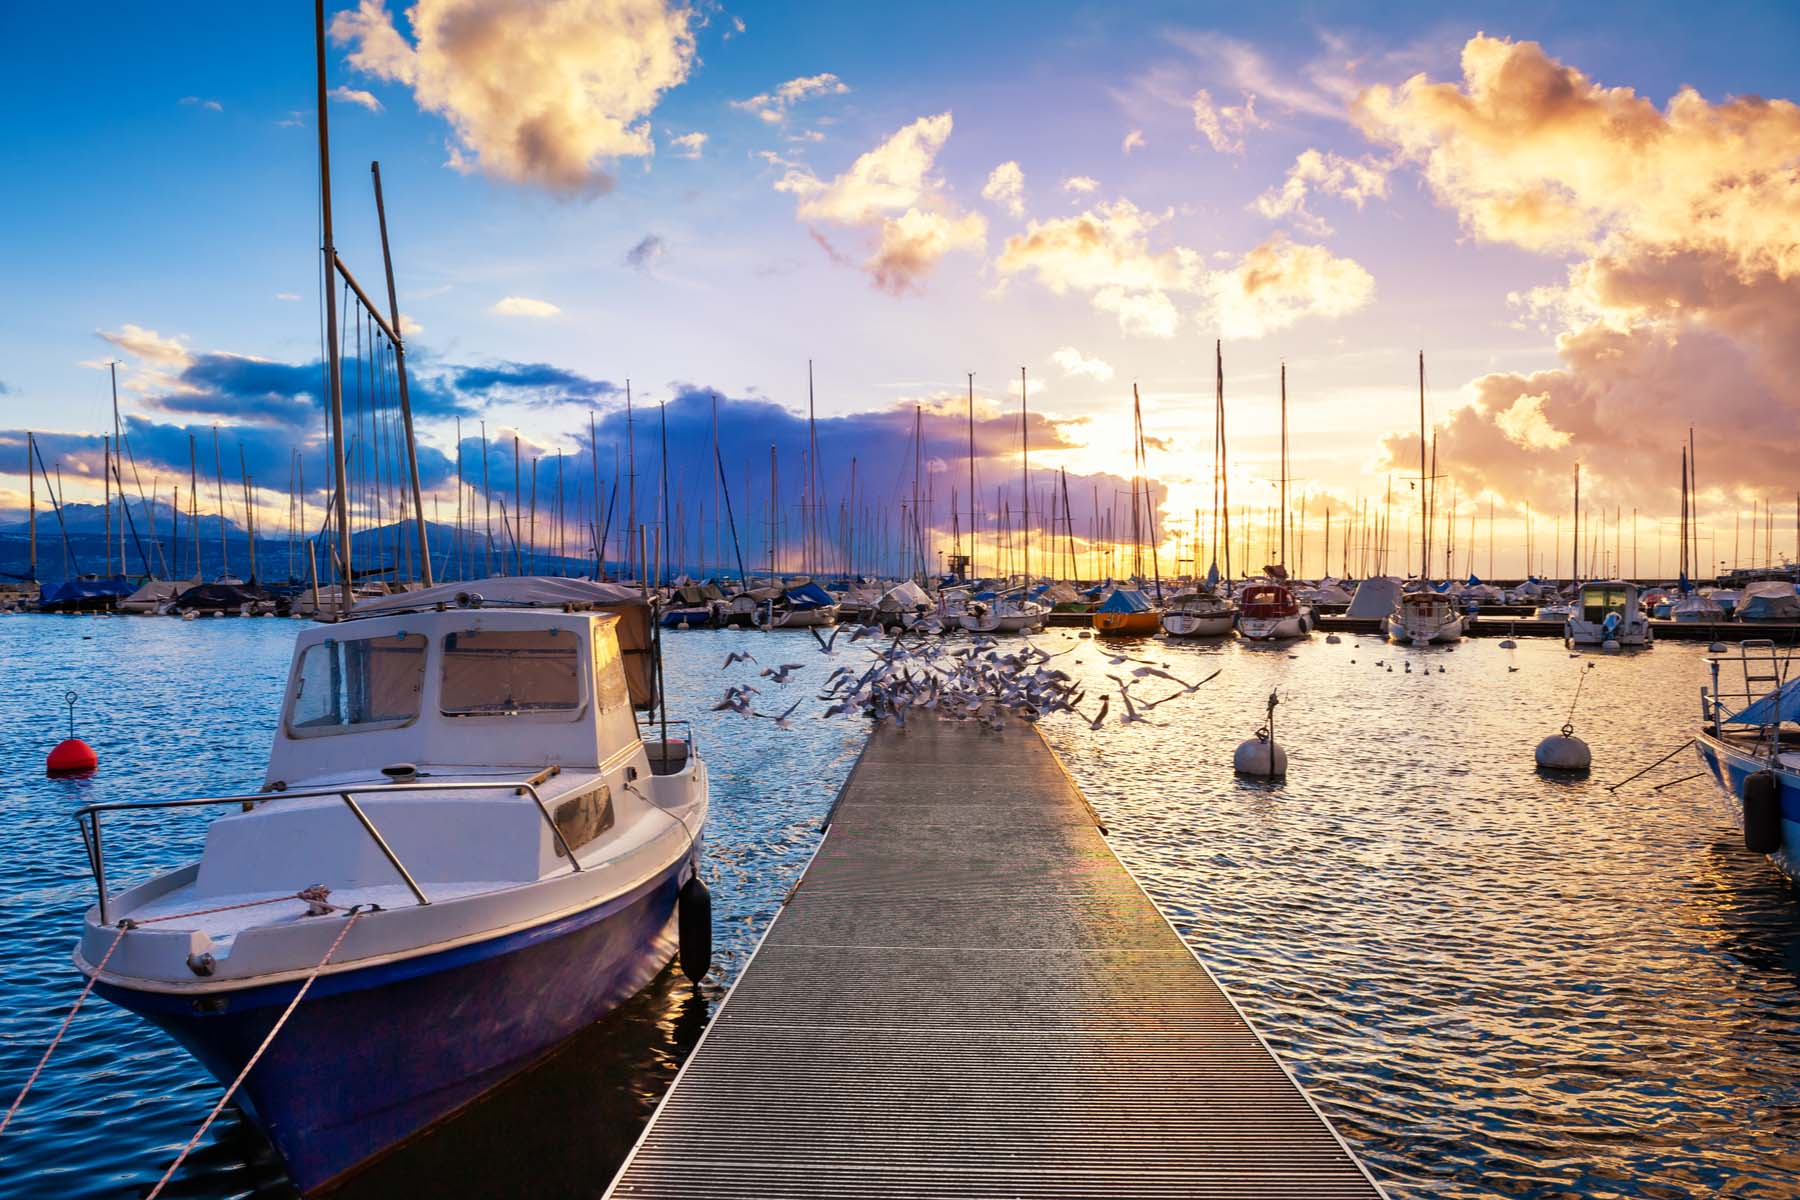 boats in Lausanne